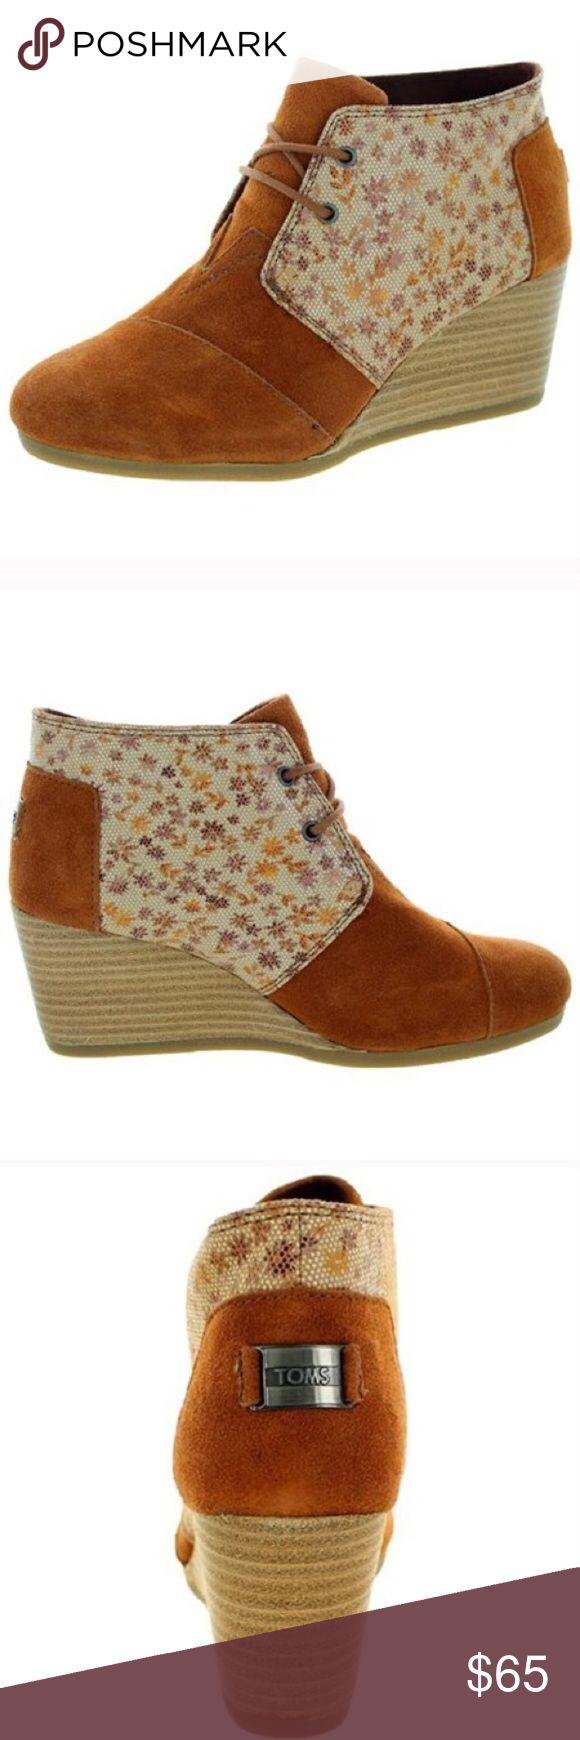 NWOT Toms Desert Wedge Sienna Brown Bootie NWOT Toms Desert Wedge Sienna Brown Bootie TOMS Shoes Ankle Boots & Booties